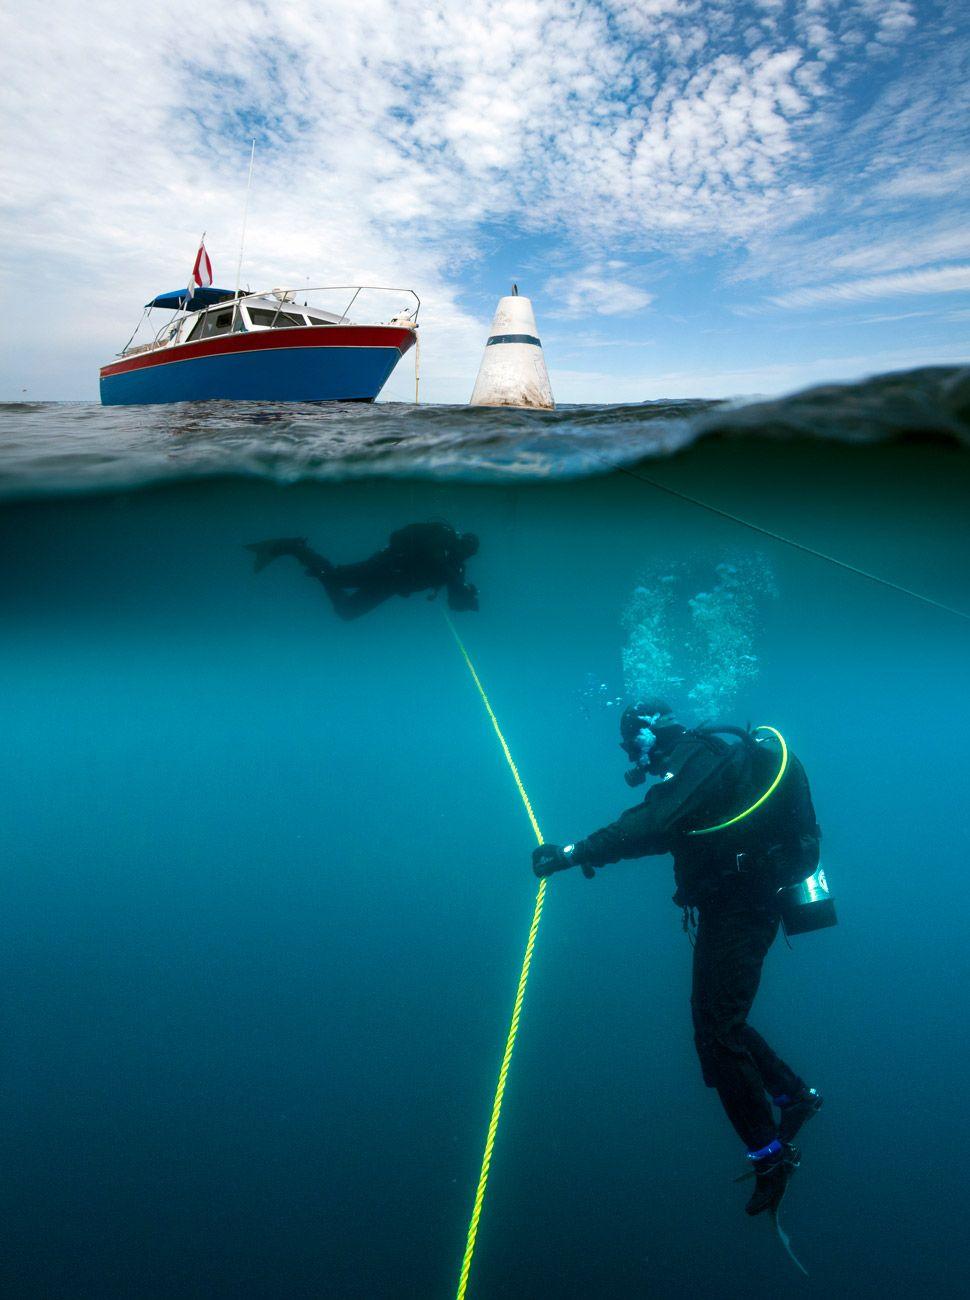 Tudor-Great-Lakes-Diving-Gear-Patrol-Ambiance